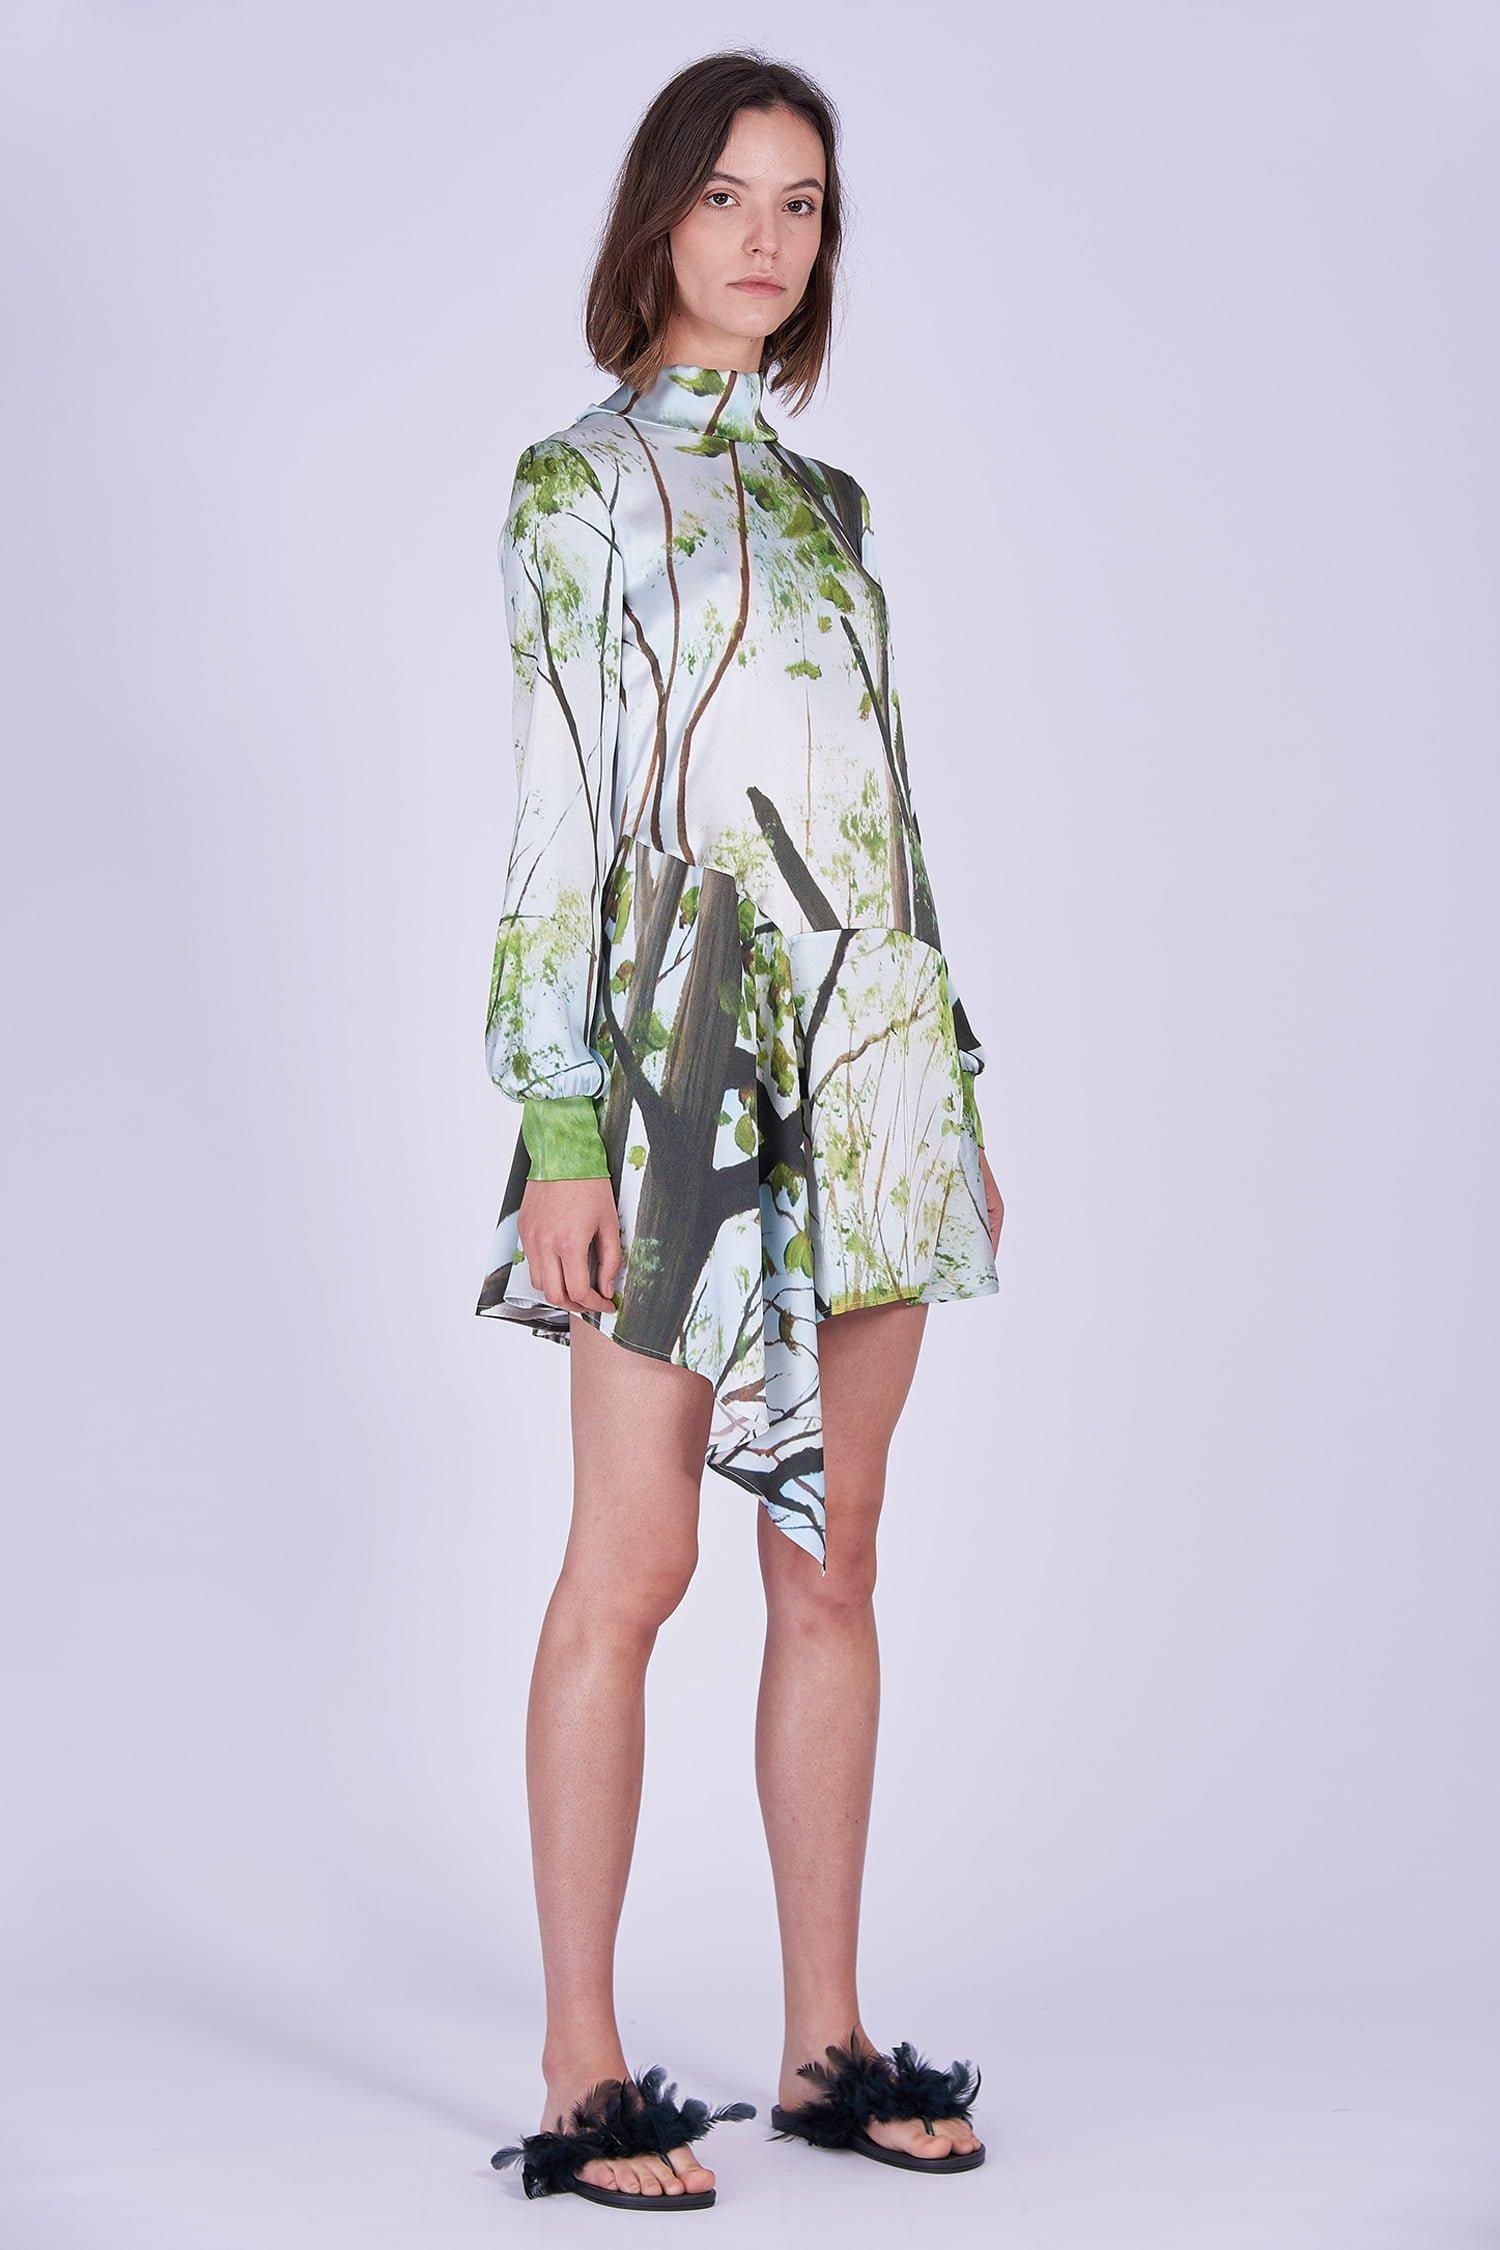 Acephala Ss2020 Printed Silk Longsleeve Dress Jedwabna Sukienka Print Rekaw Front Side